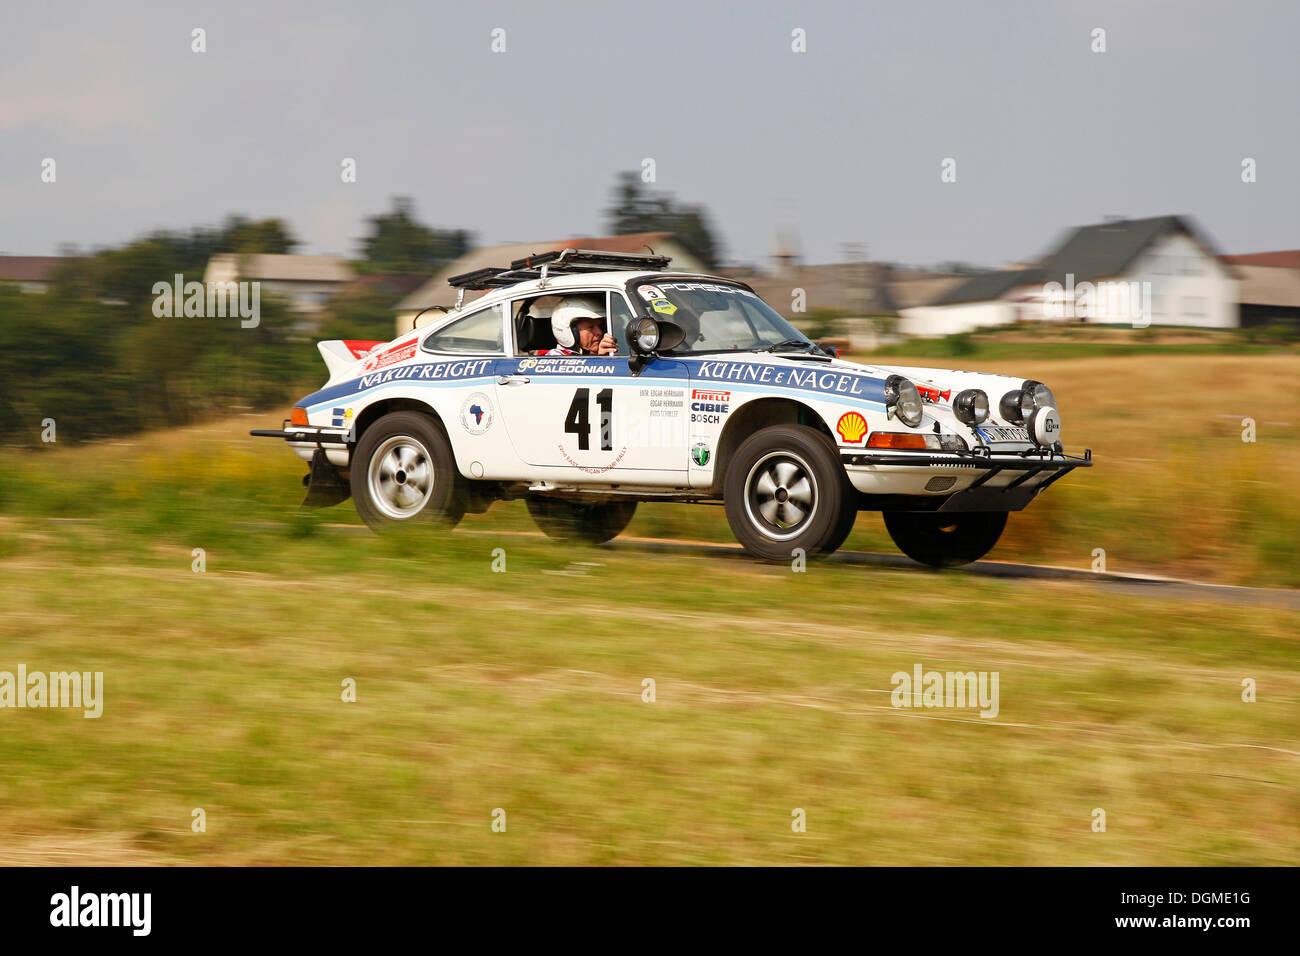 Vintage Car Eifel Rally 2012, Porsche 911 RS, built in 1974, used ...